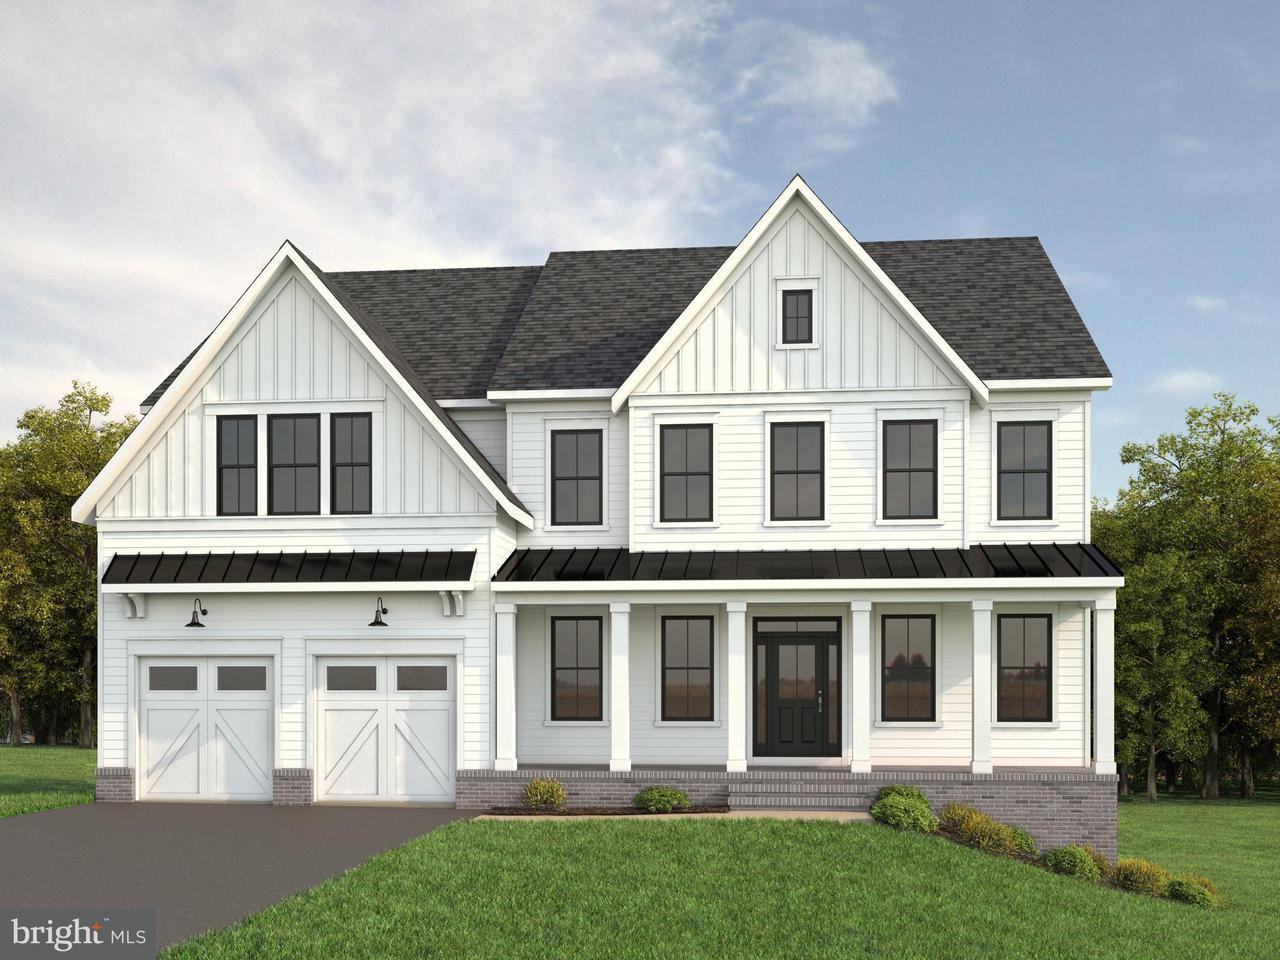 Single Family Home for Sale at 6710 Osborn Street 6710 Osborn Street Falls Church, Virginia 22046 United States